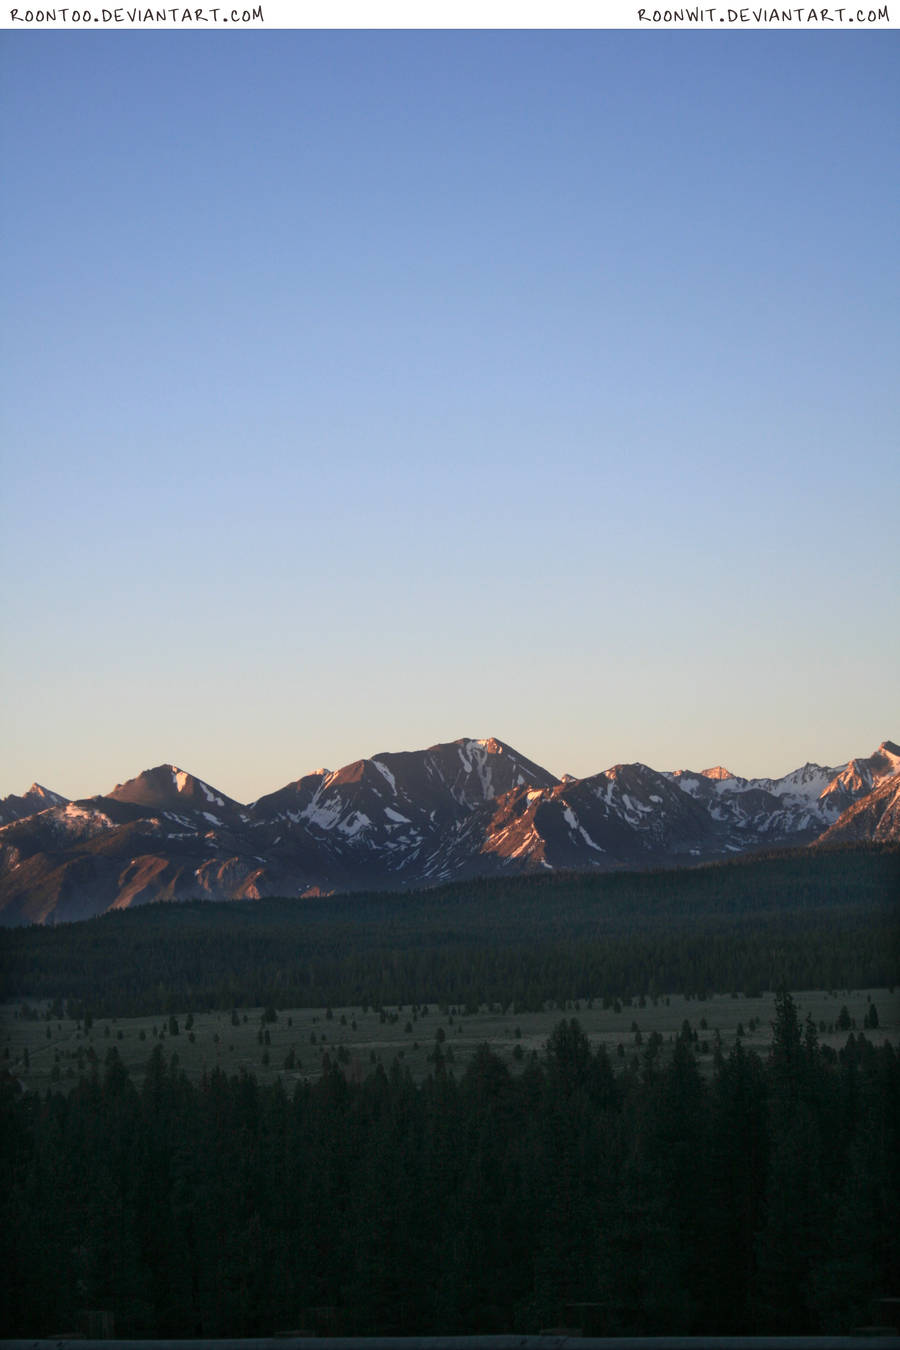 Sierra mountain sunrise 1 by RoonToo